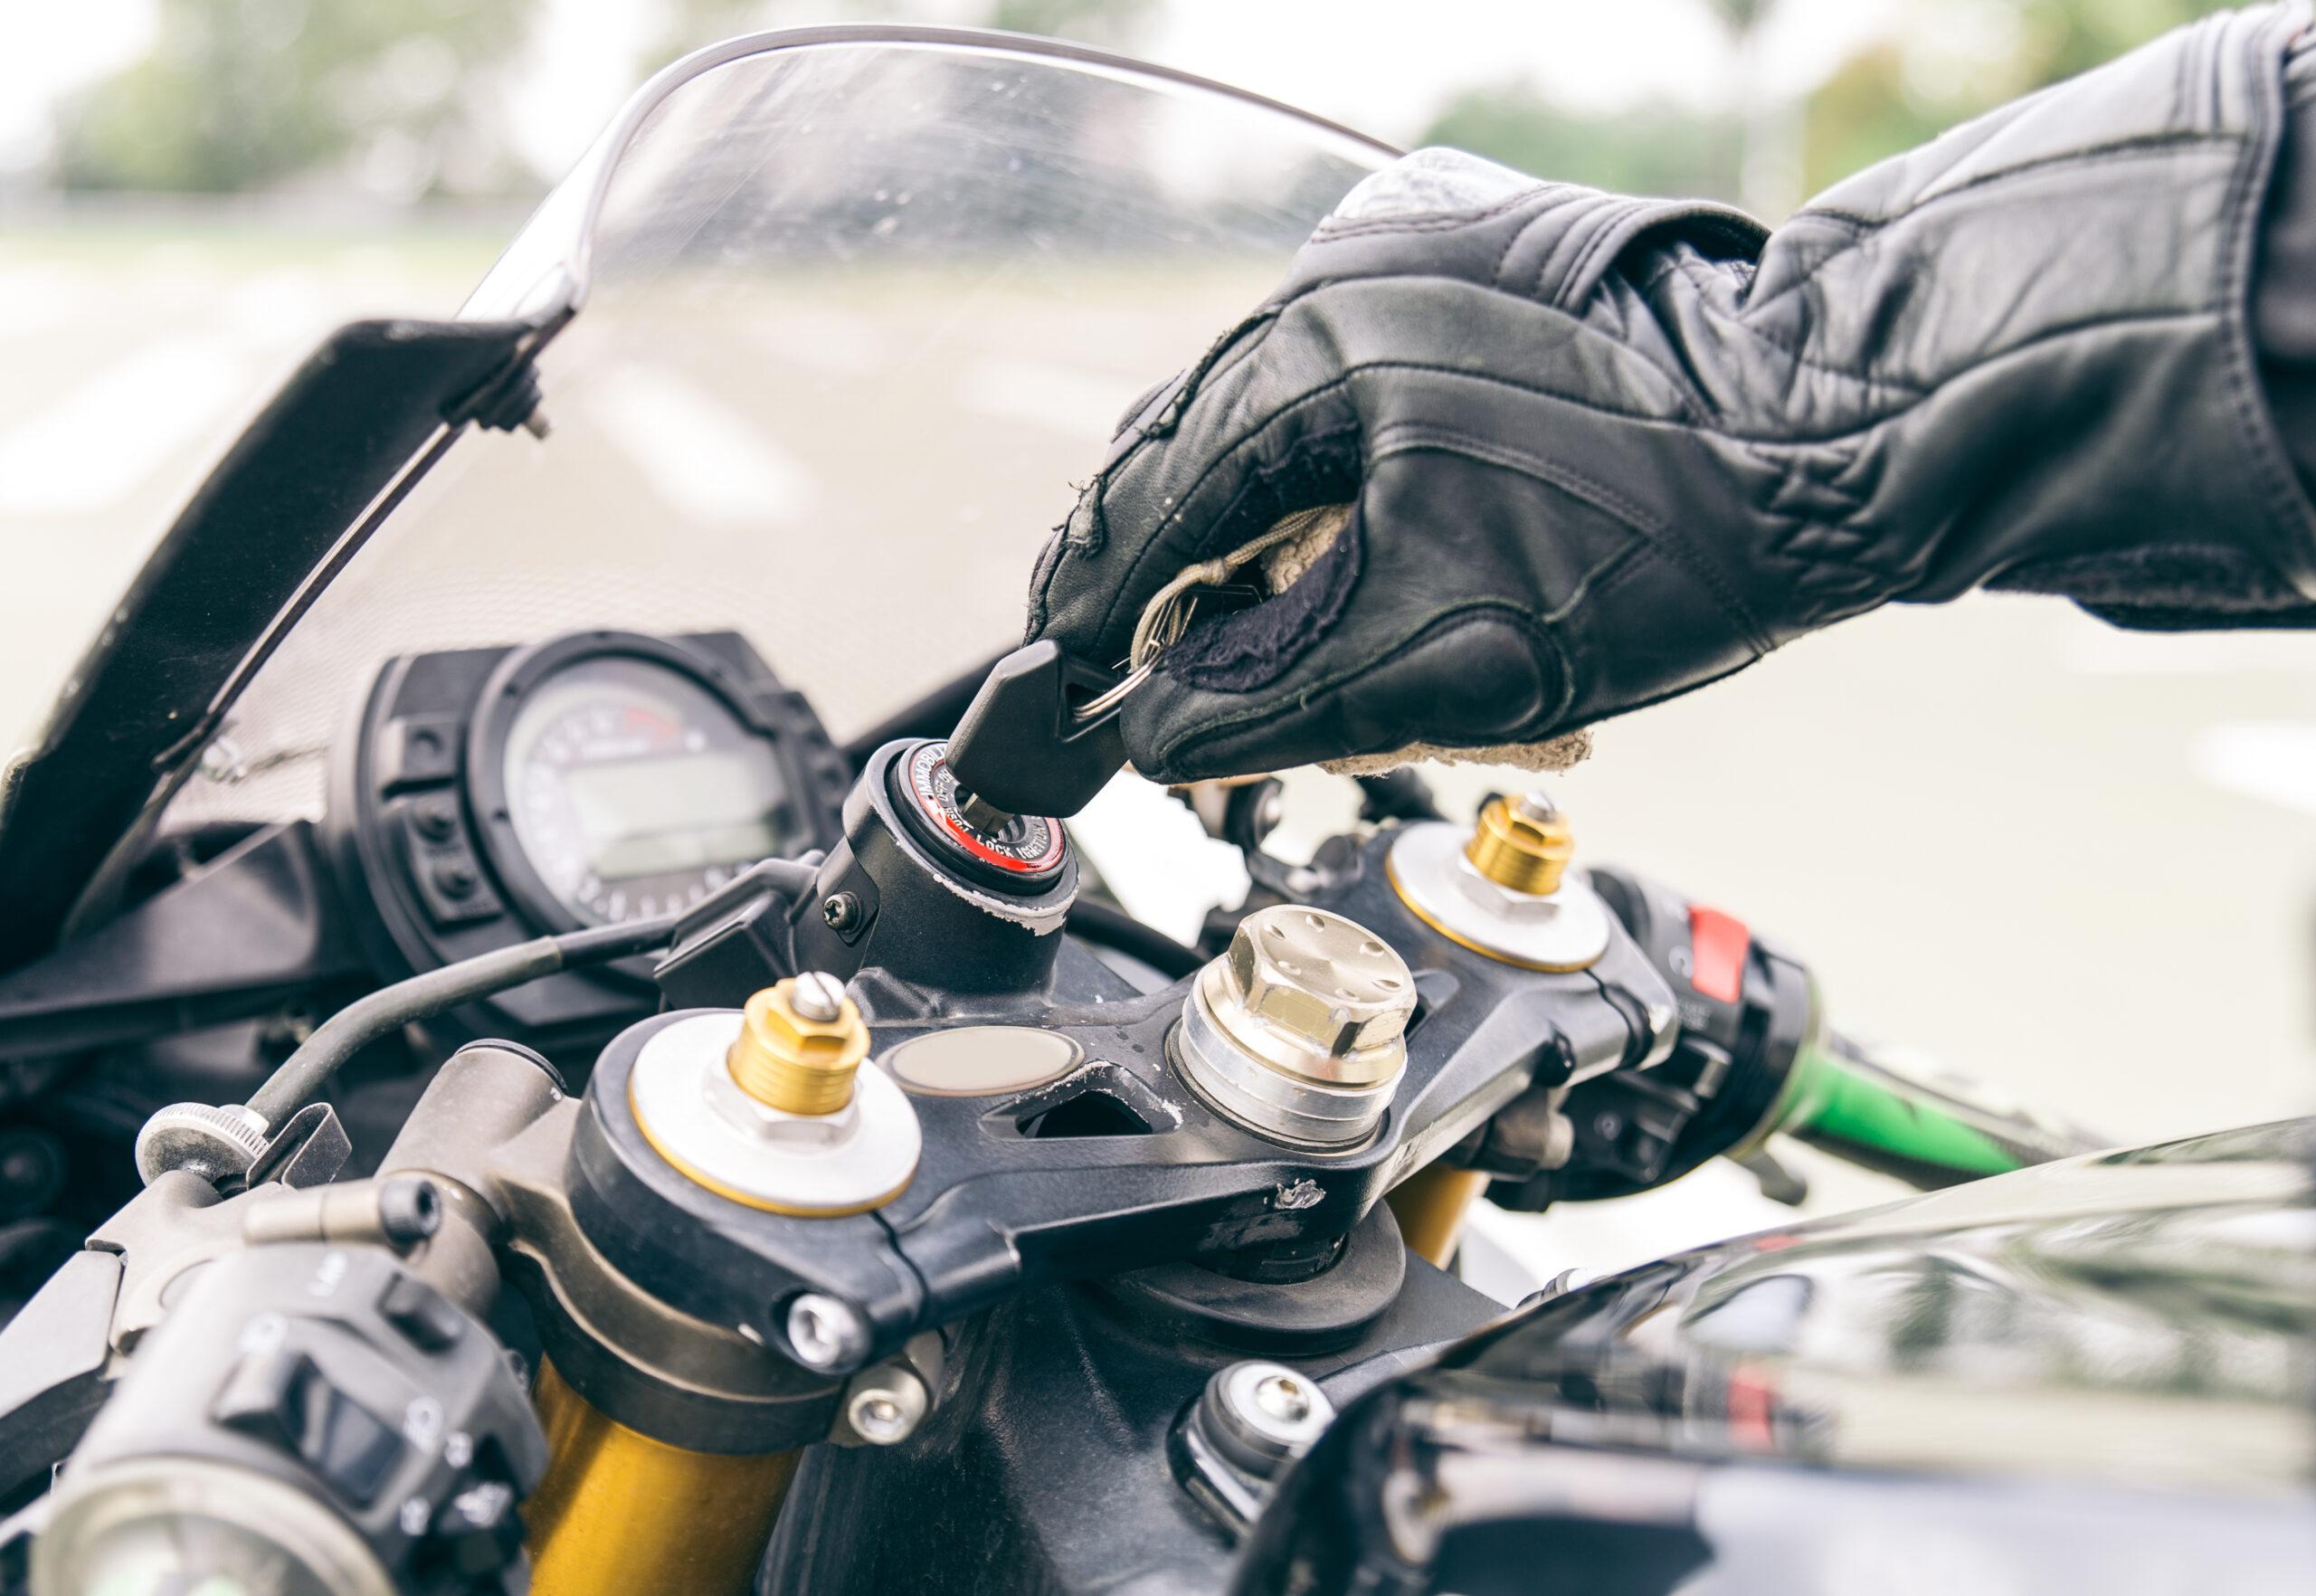 FAQ: Can an auto locksmith work on motorcycles?